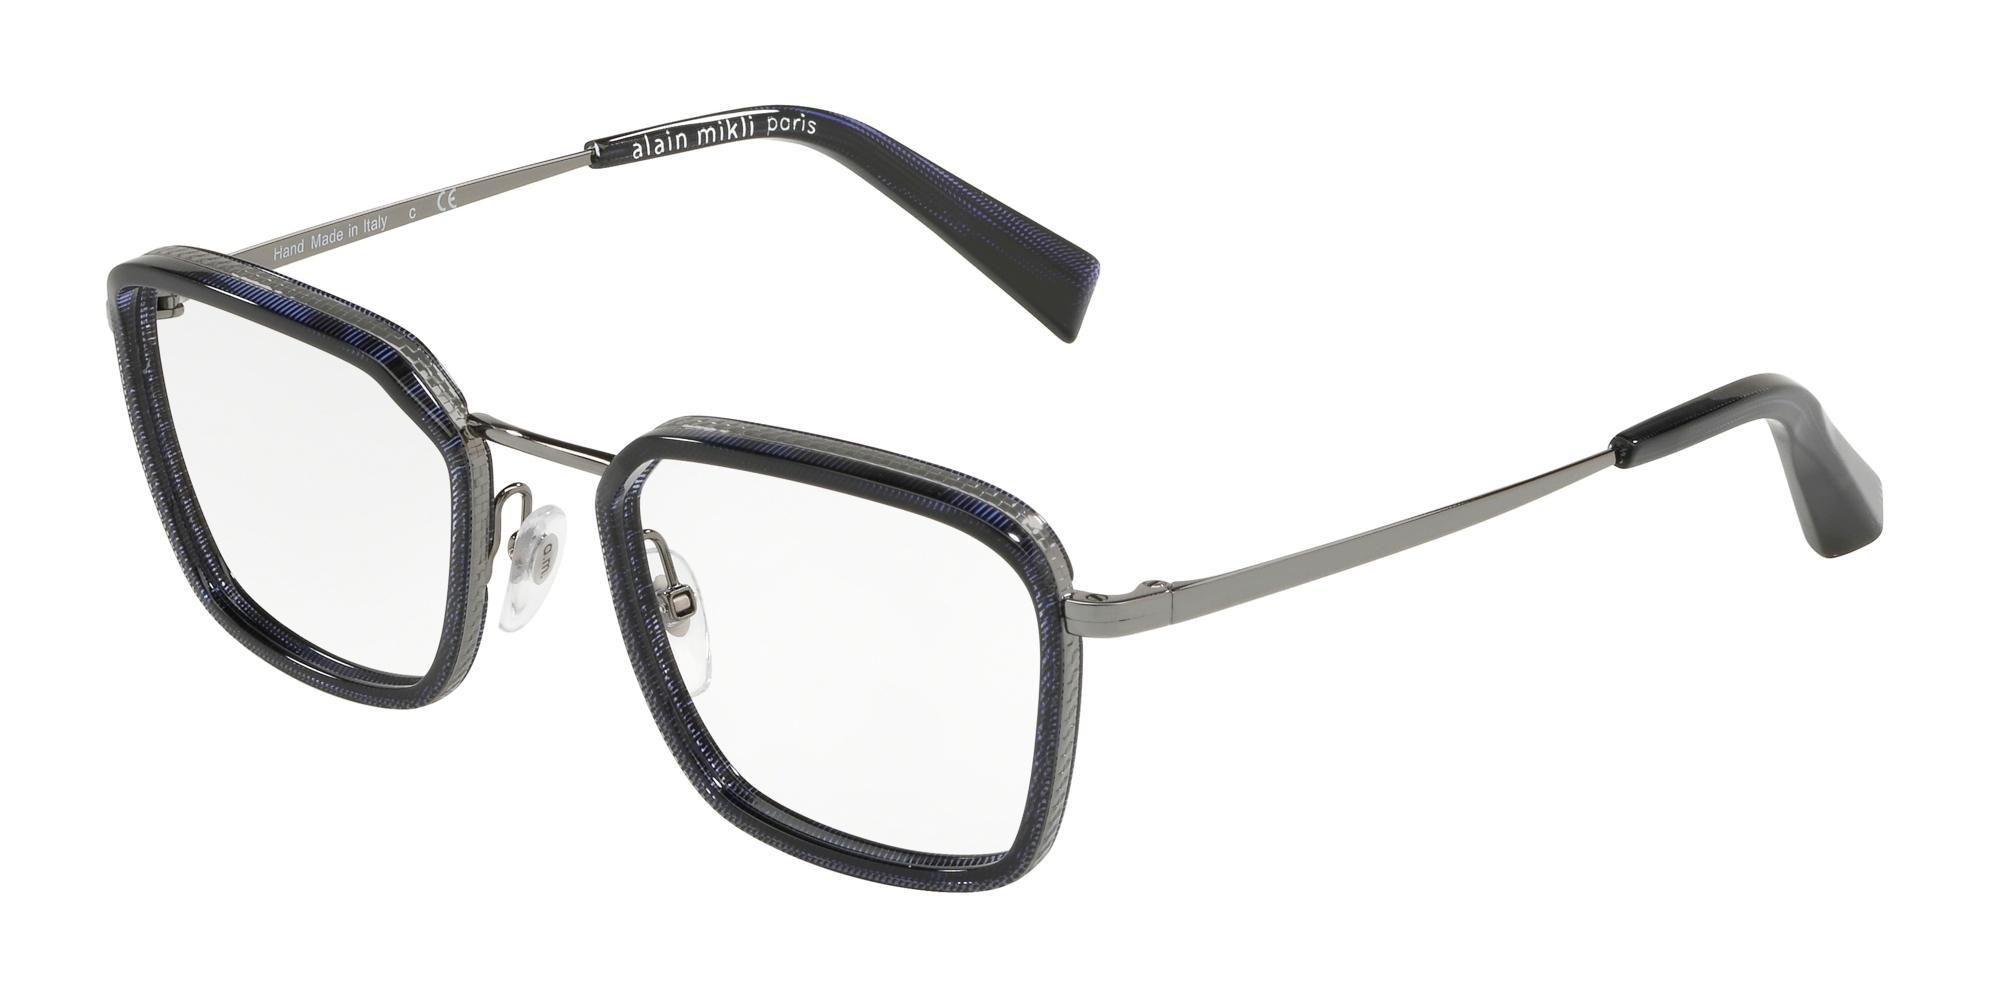 Alain Mikli eyeglasses BEAUCARRE 0A02028